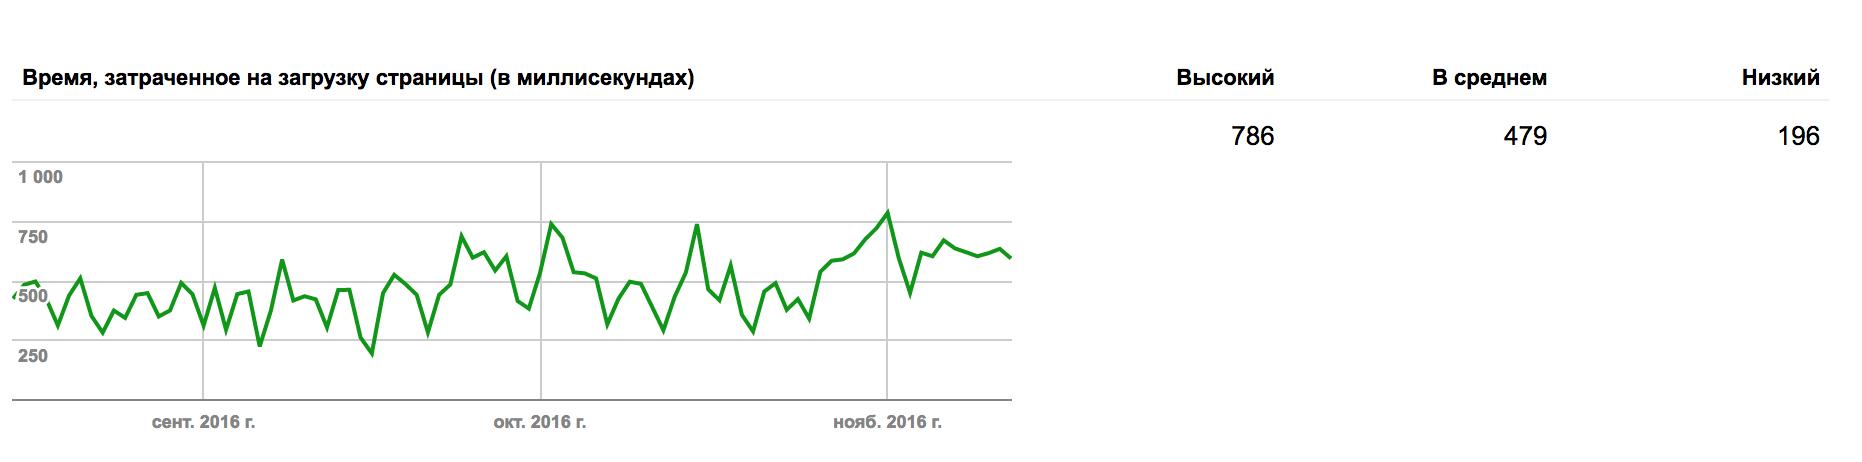 Google Вебмастер - статистика сканирования страниц сайта